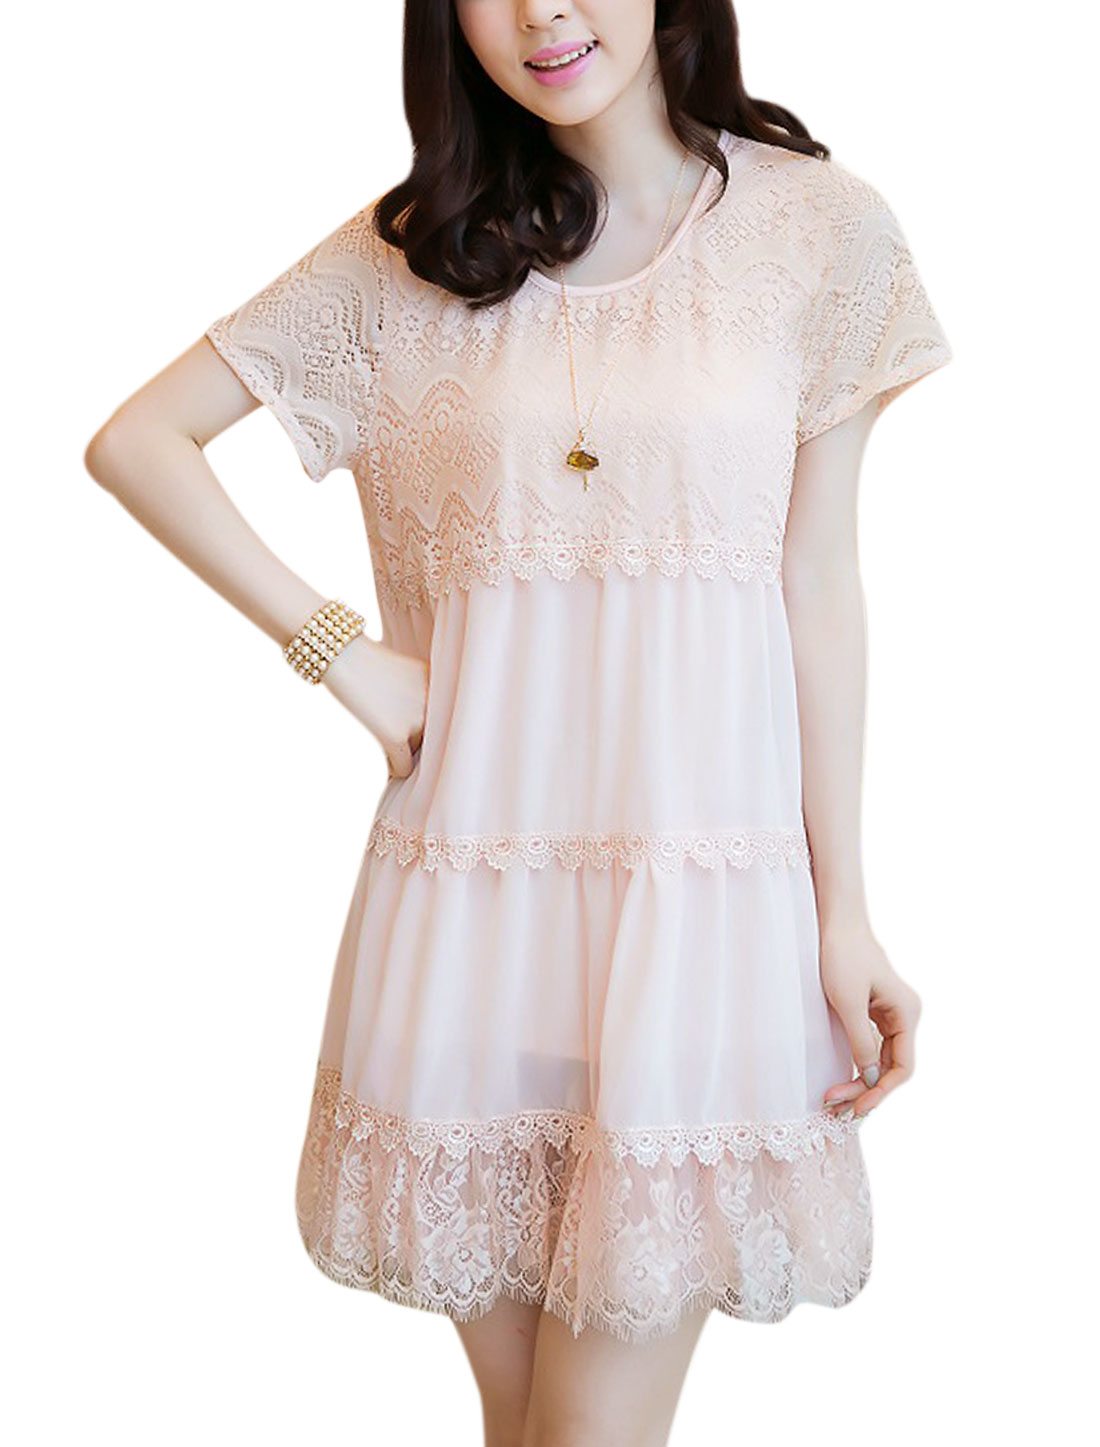 Lady Sweet Short Sleeve Lace Splice Flouncing Hem Chiffon Dress Light Pink S